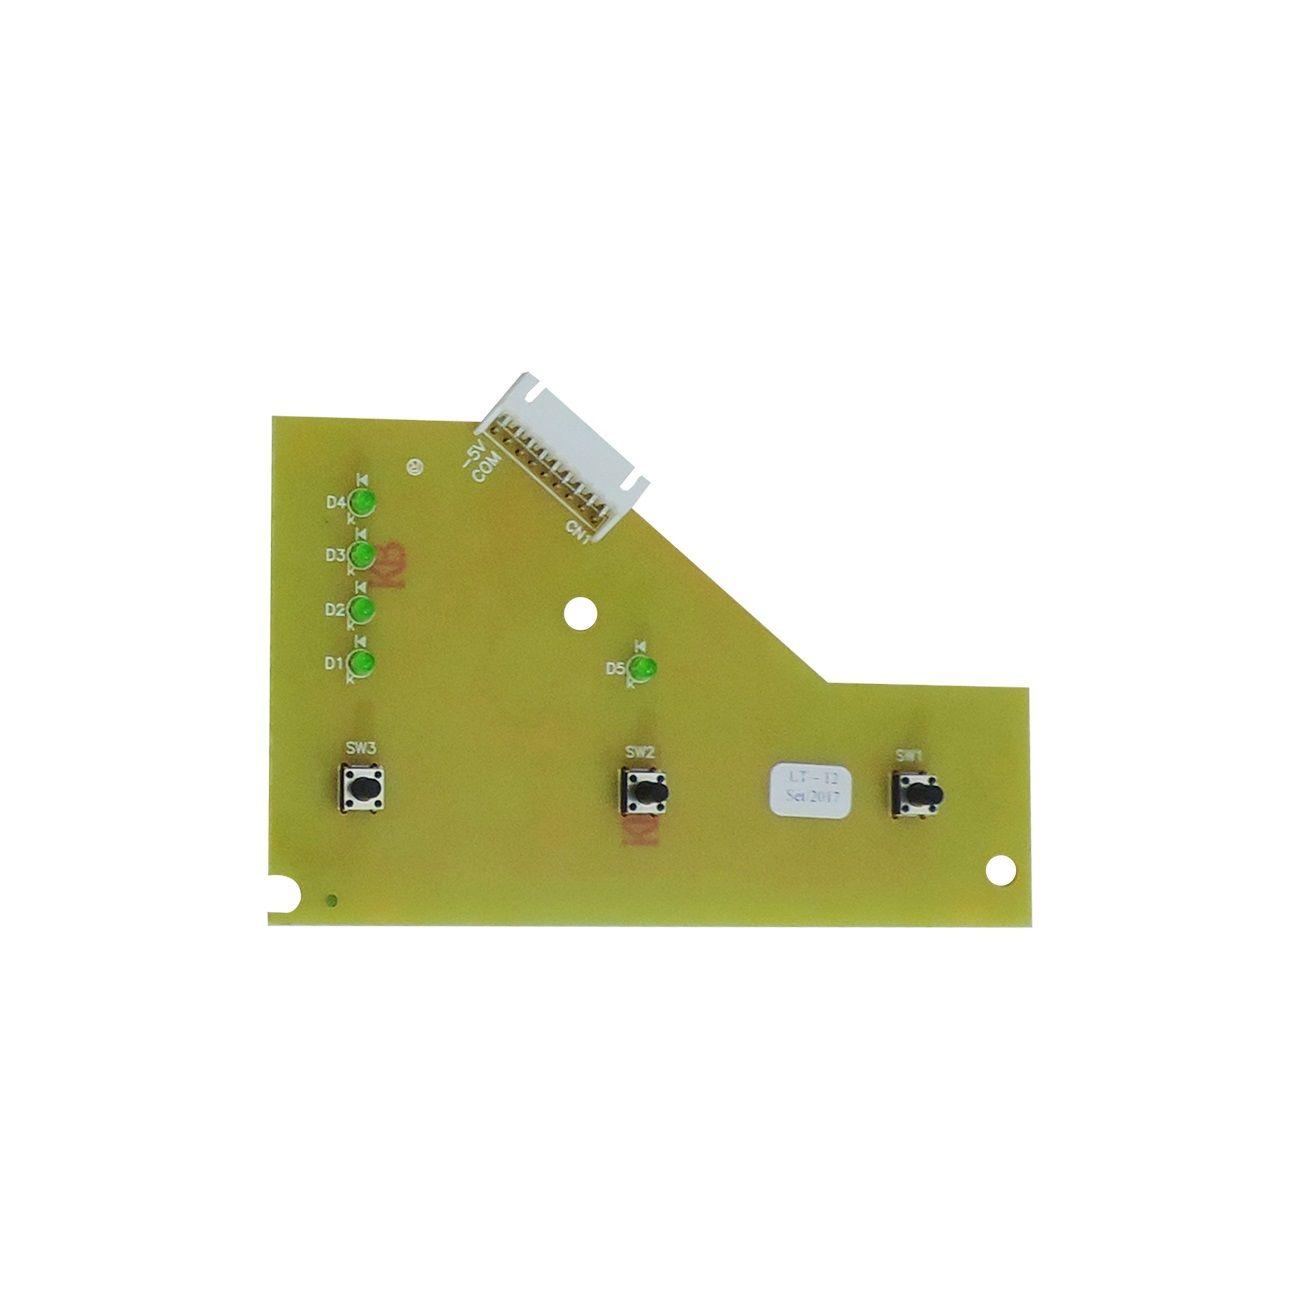 Placa Interface Compatível Lavadora Electrolux Lte12 64800634 CDI